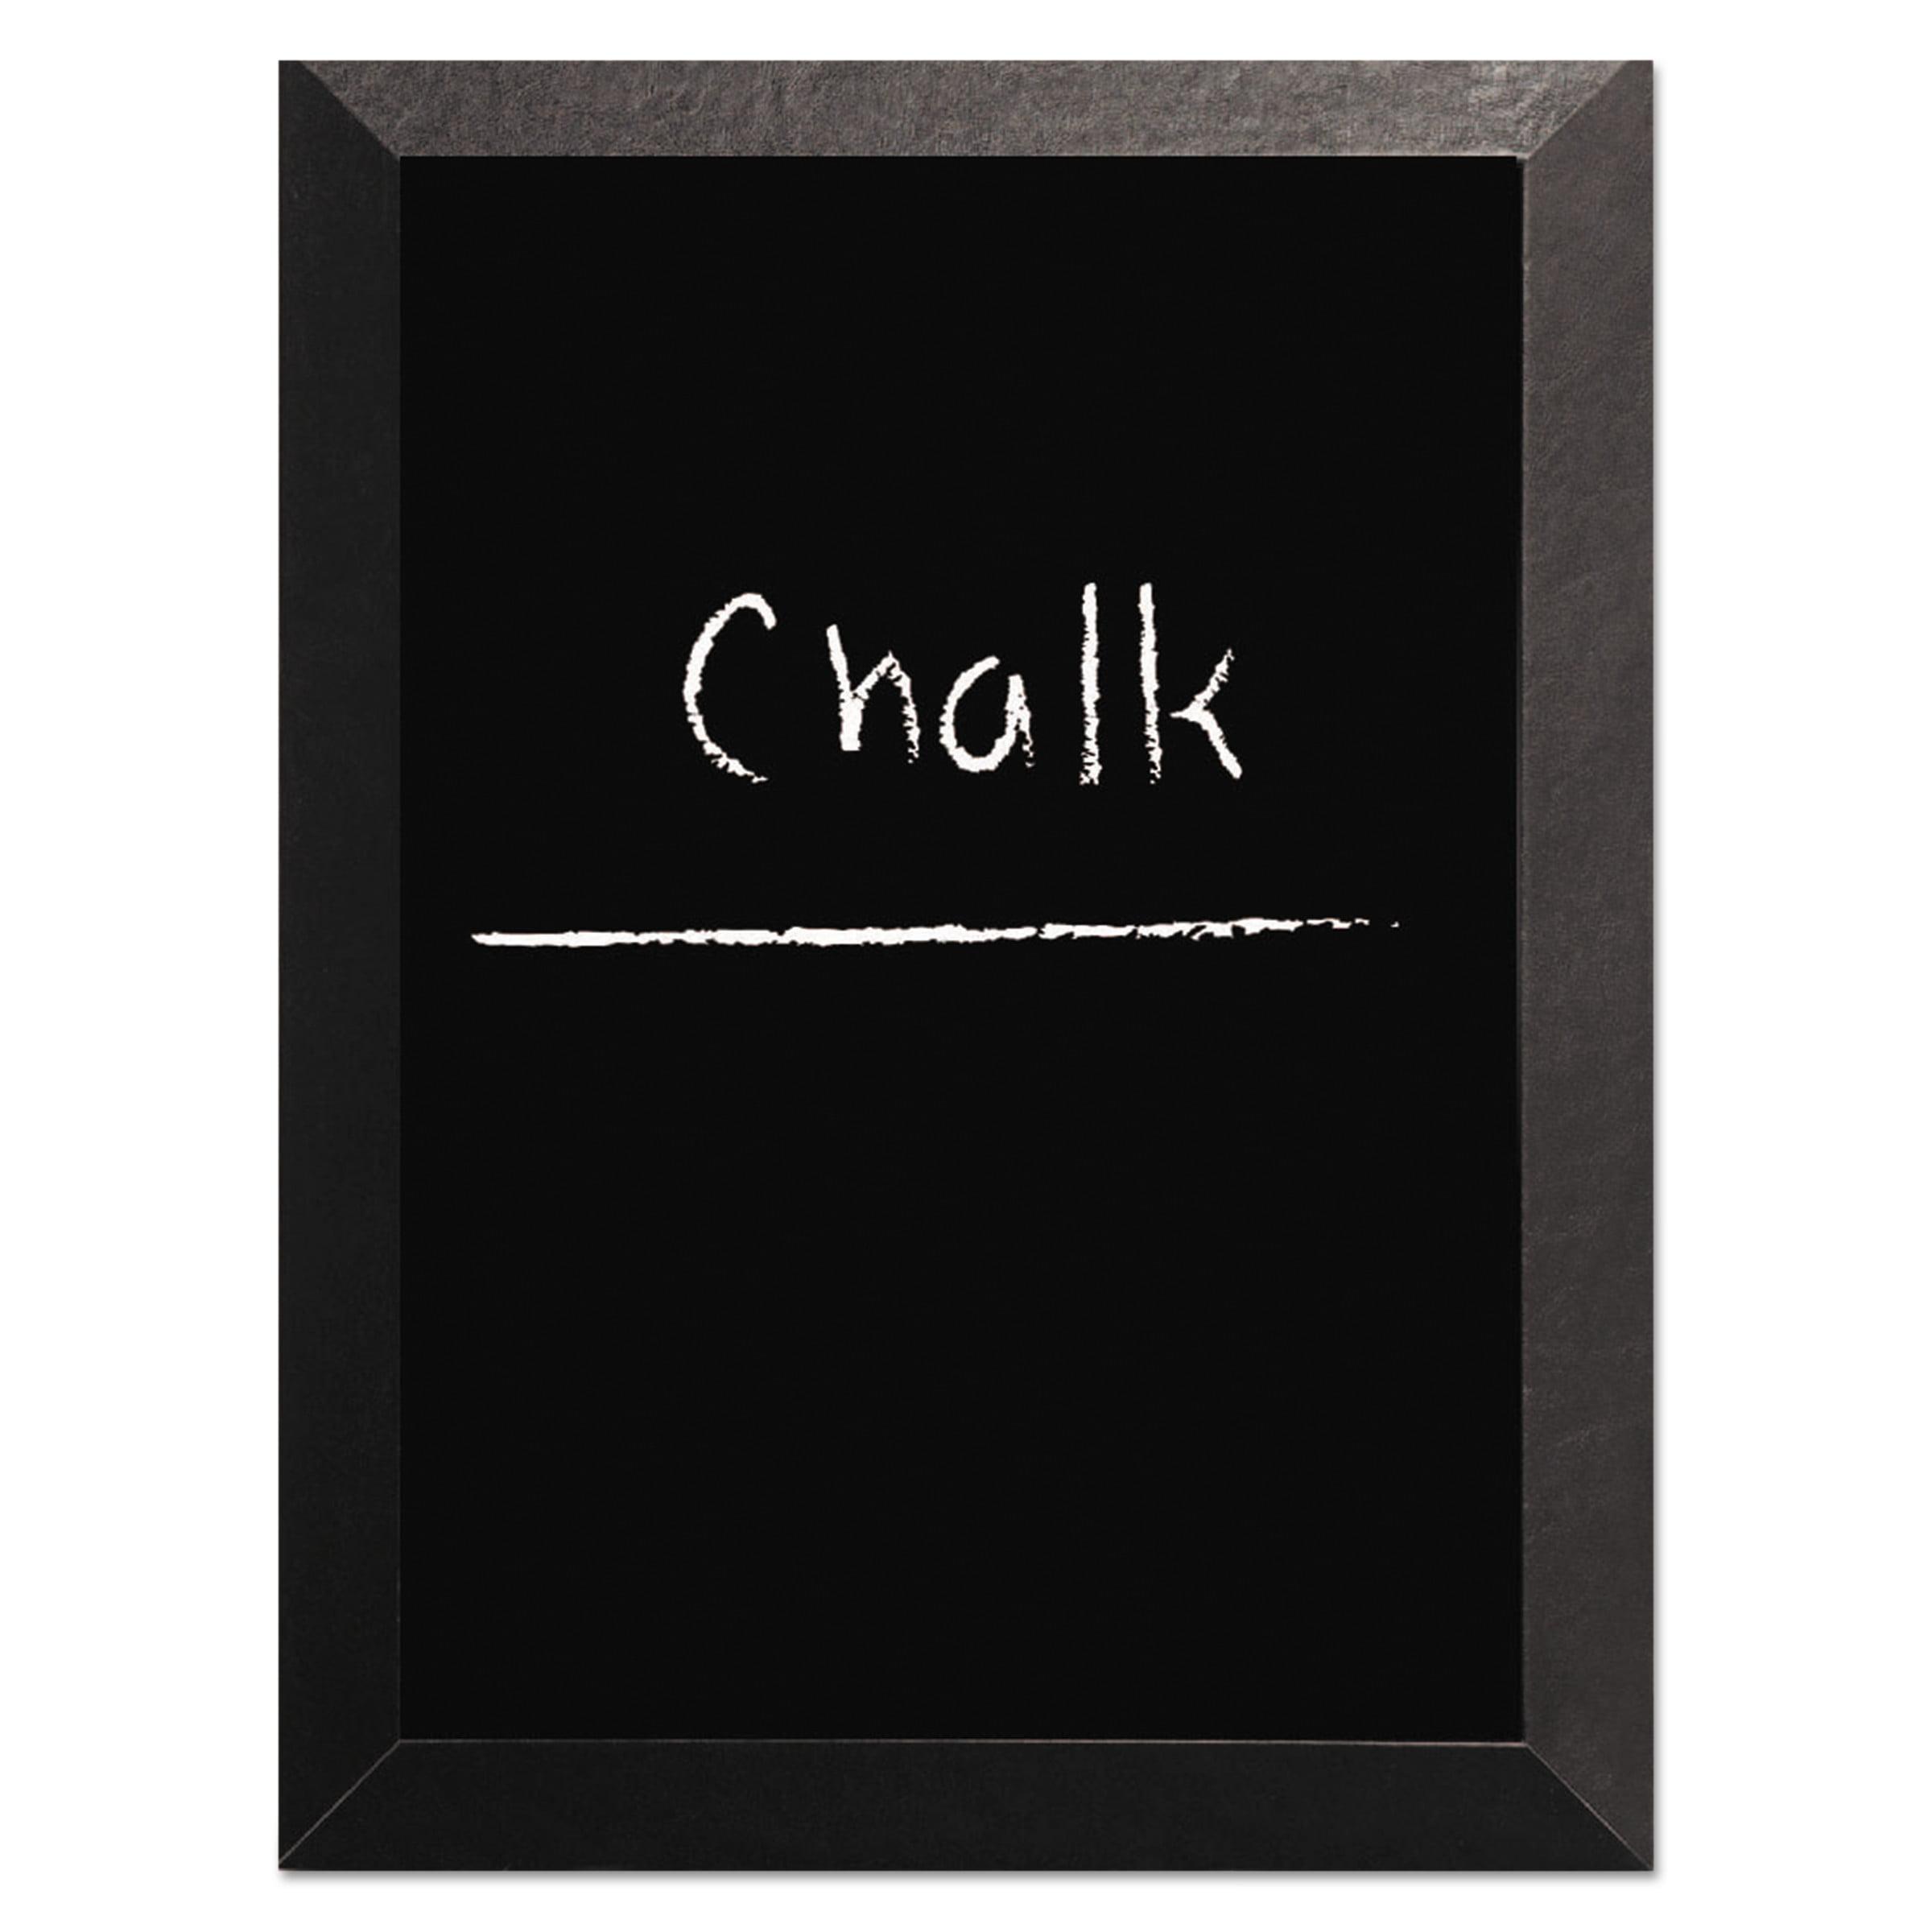 MasterVision Kamashi Chalk Board, 48 x 36, Black Frame